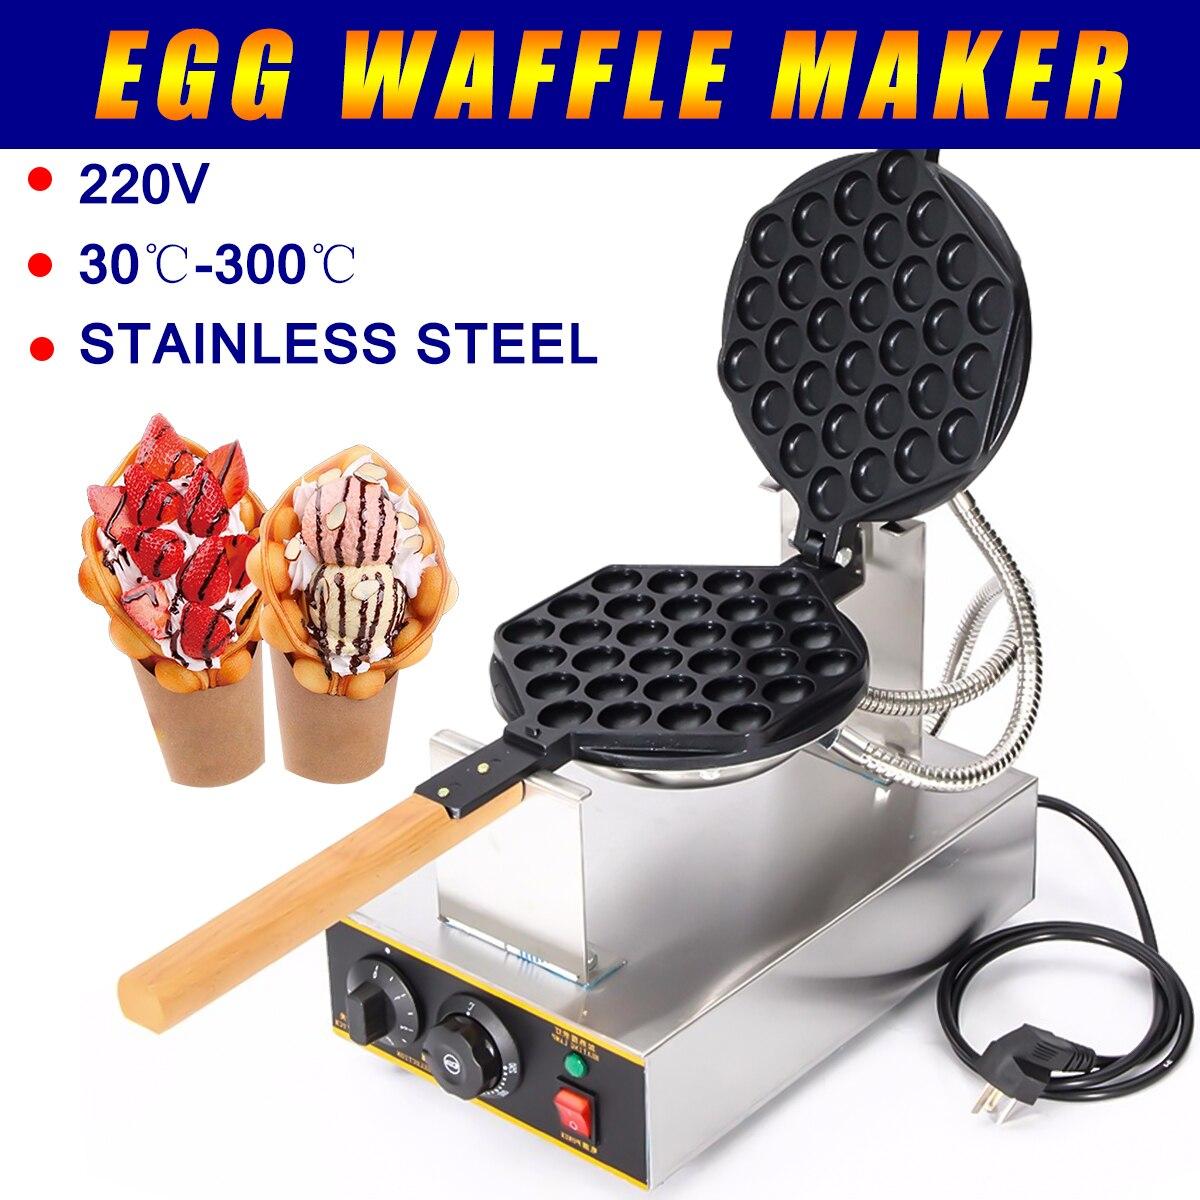 Warmtoo 220V 1.3Kw Electric Egg Cake Machine Egg Pancake Machine Oven Waffle Maker Machine Stainless Steel electric egg cake machine qq egg machine egg aberdeen waffle machine